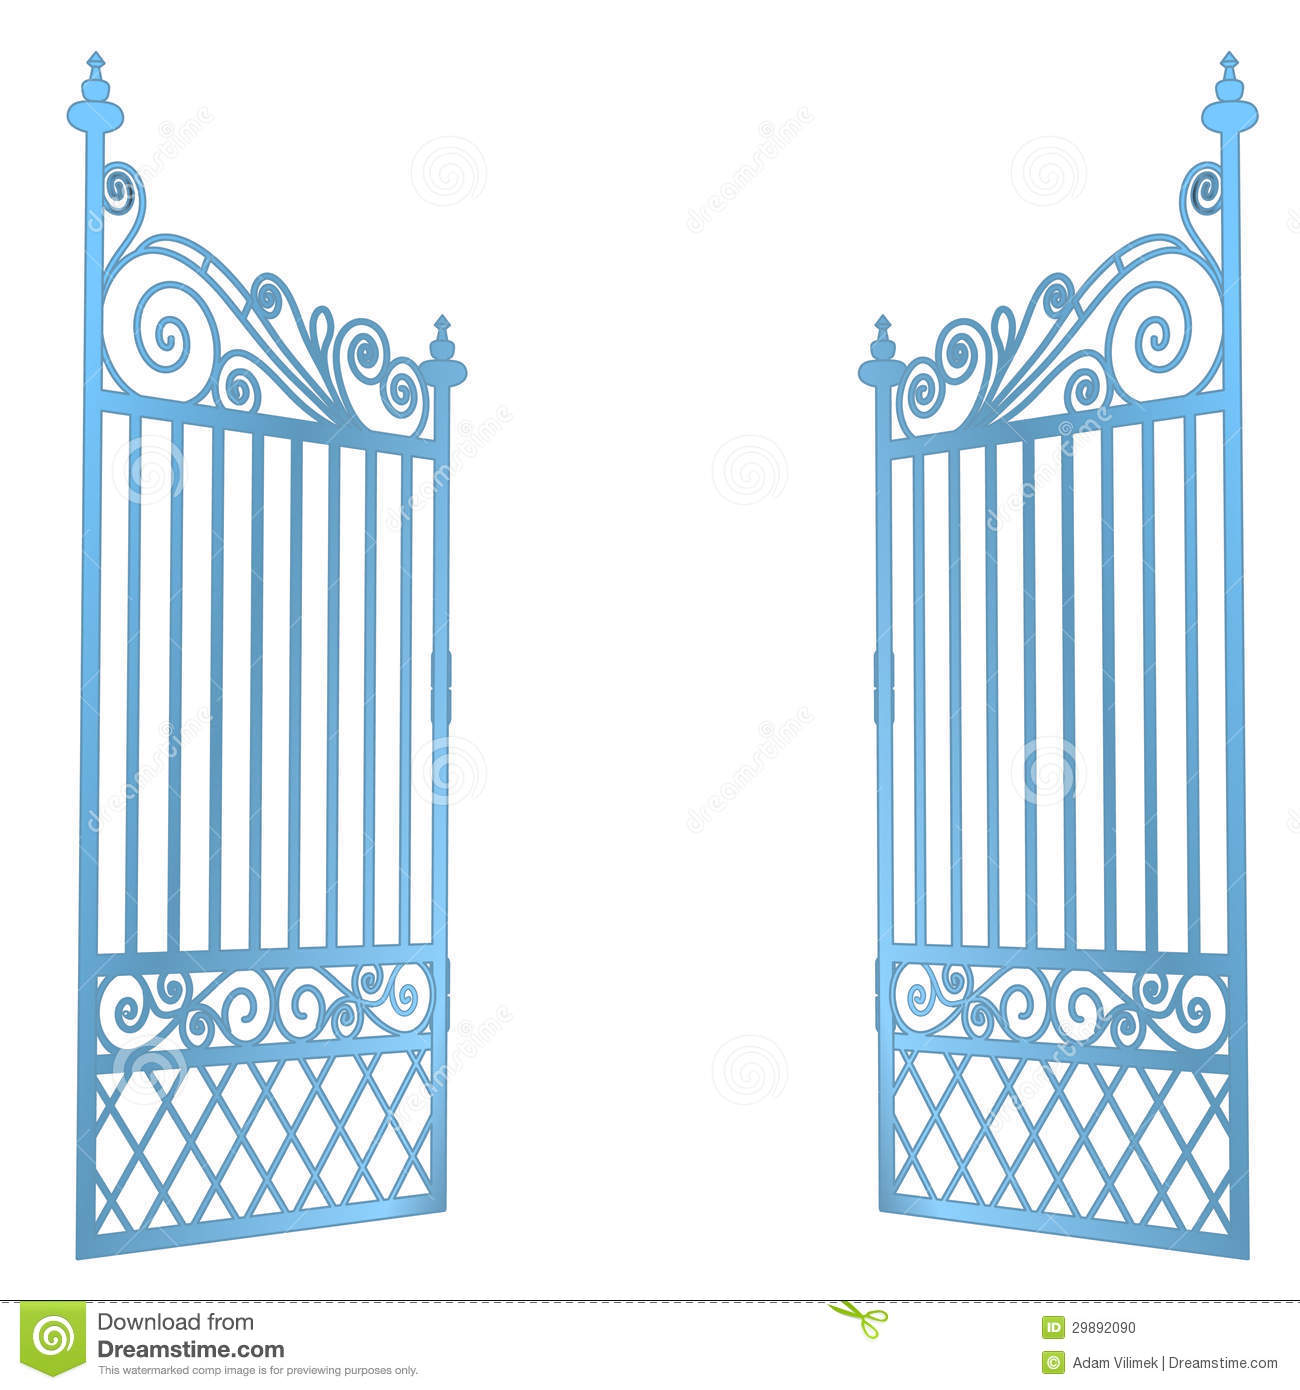 Heaven gate clipart.